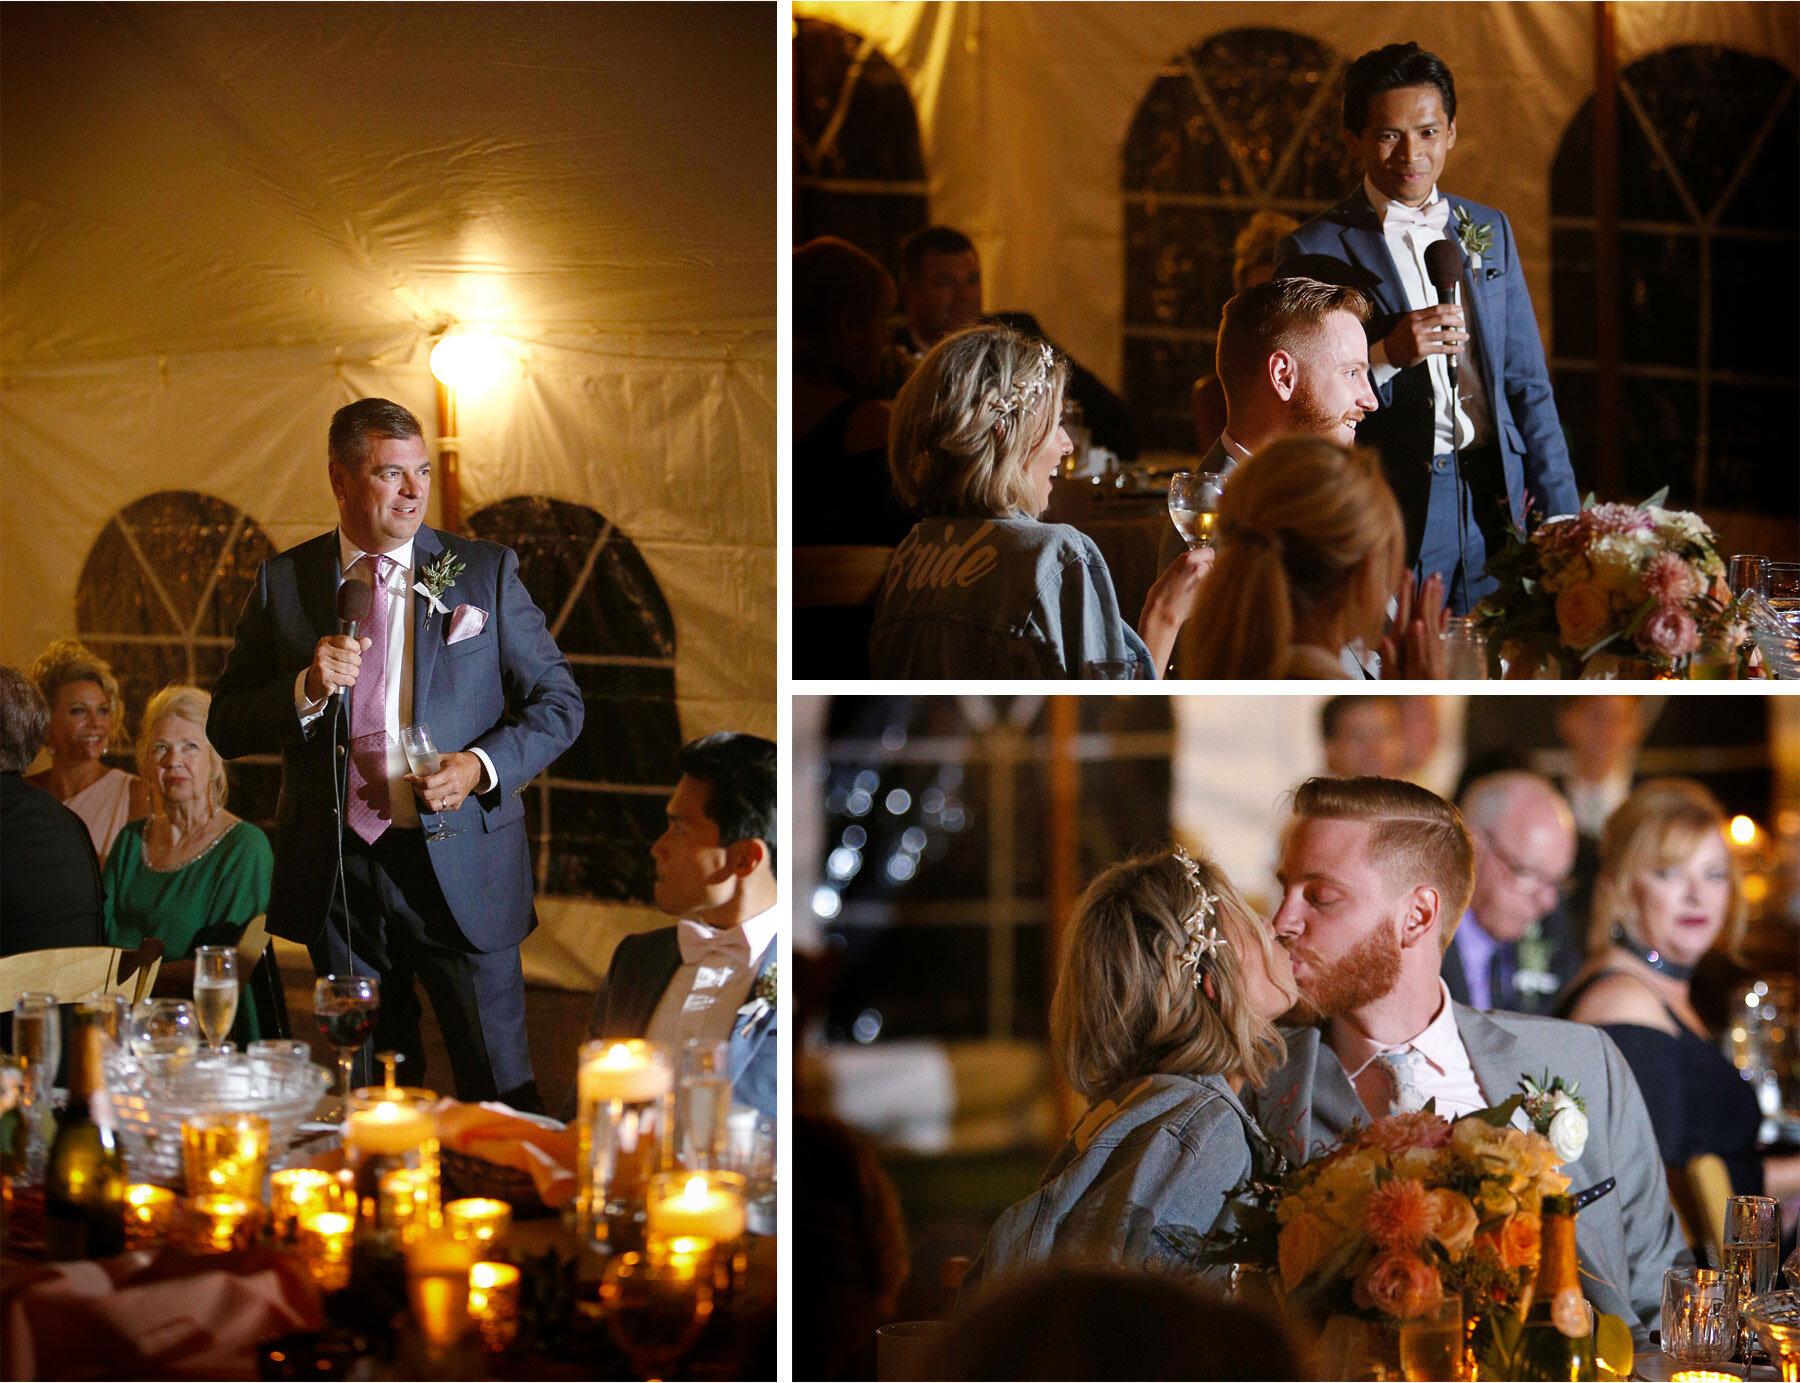 20-Vick-Photography-Wedding-Duluth-Minnesota-Glensheen-Mansion-Reception-Tent-Night-Outdoor-Summer-Toasts-Catherine-and-John.jpg